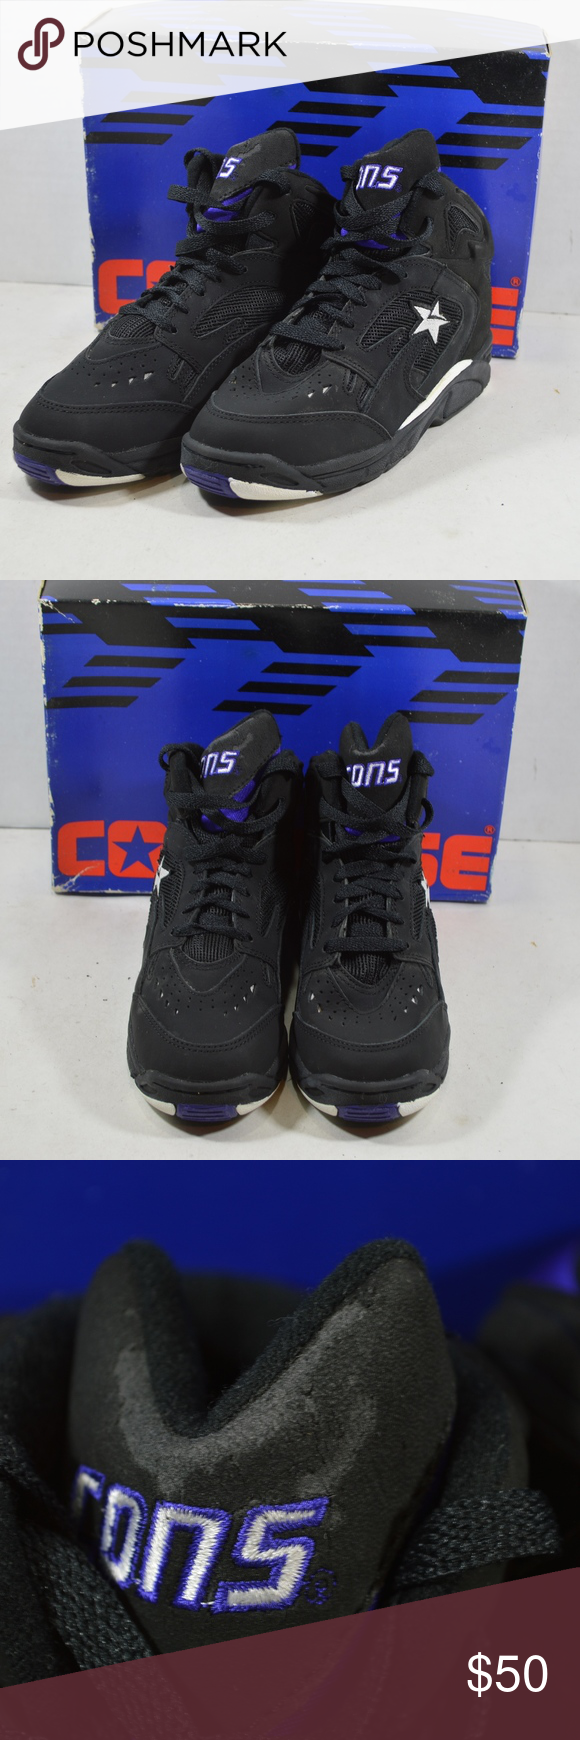 Vintage 90s Converse Mens React Basketball Shoes Vintage 90s